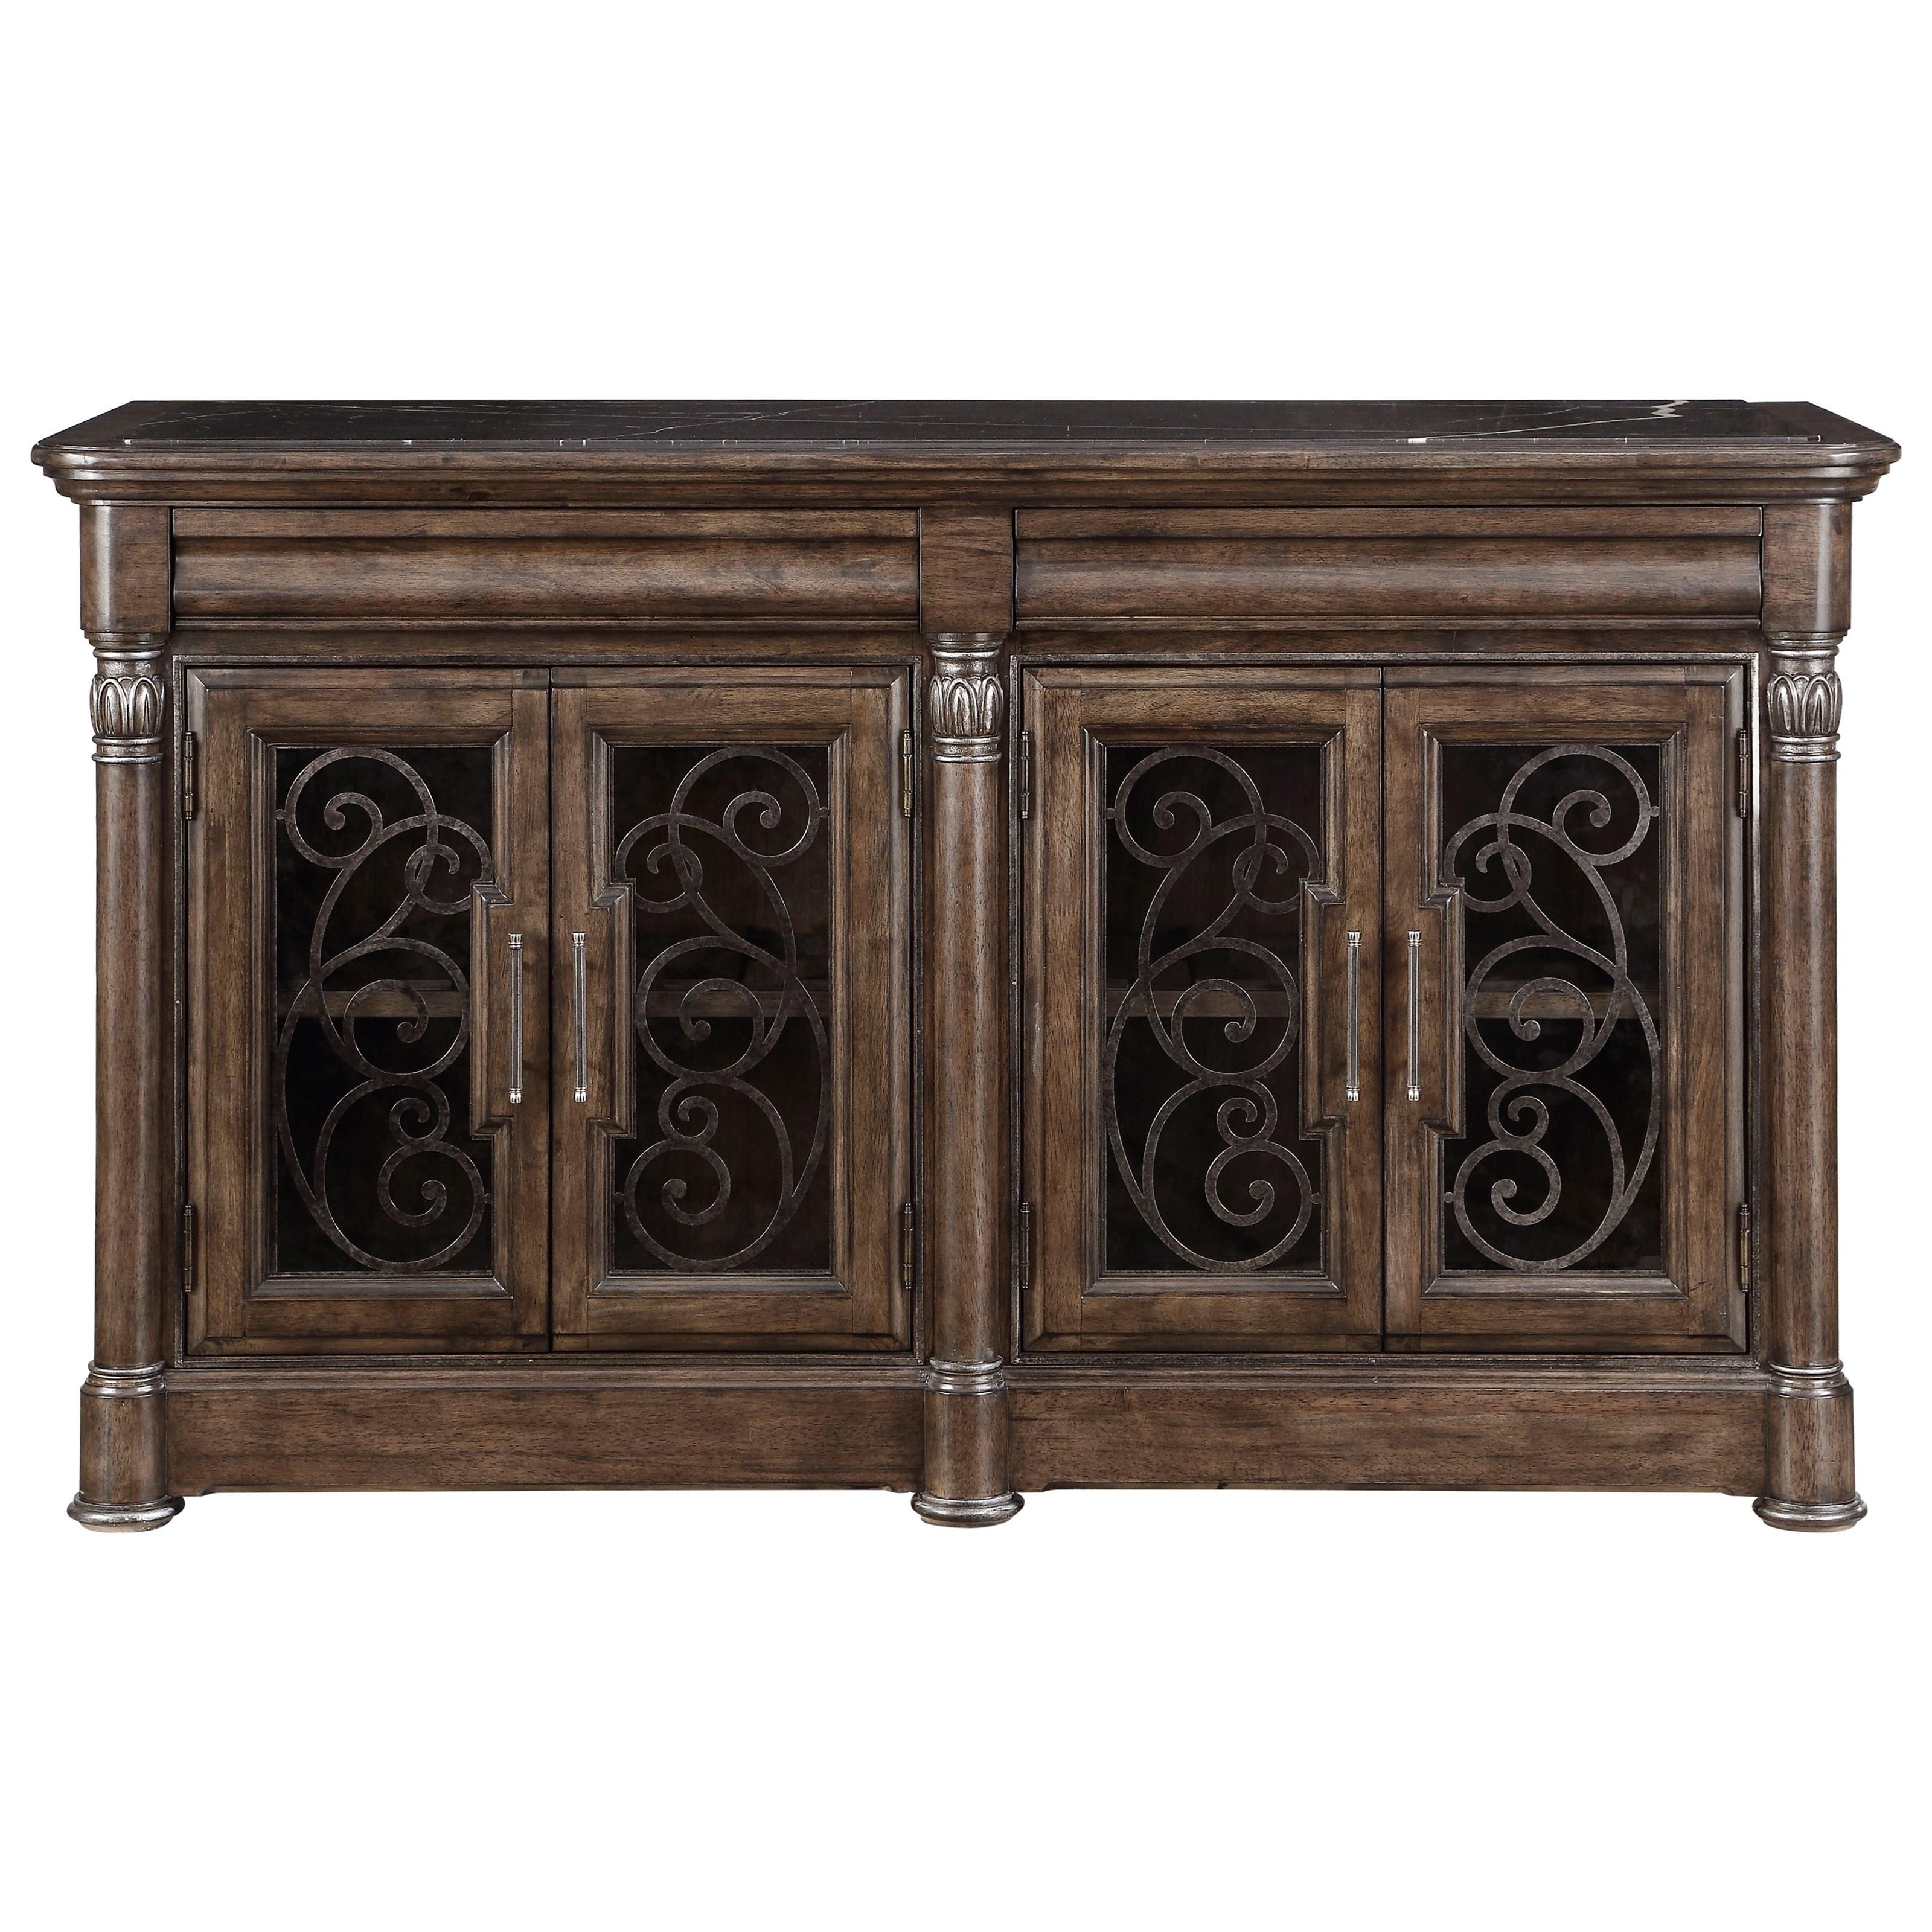 Landmark Buffet by A.R.T. Furniture Inc at Dream Home Interiors